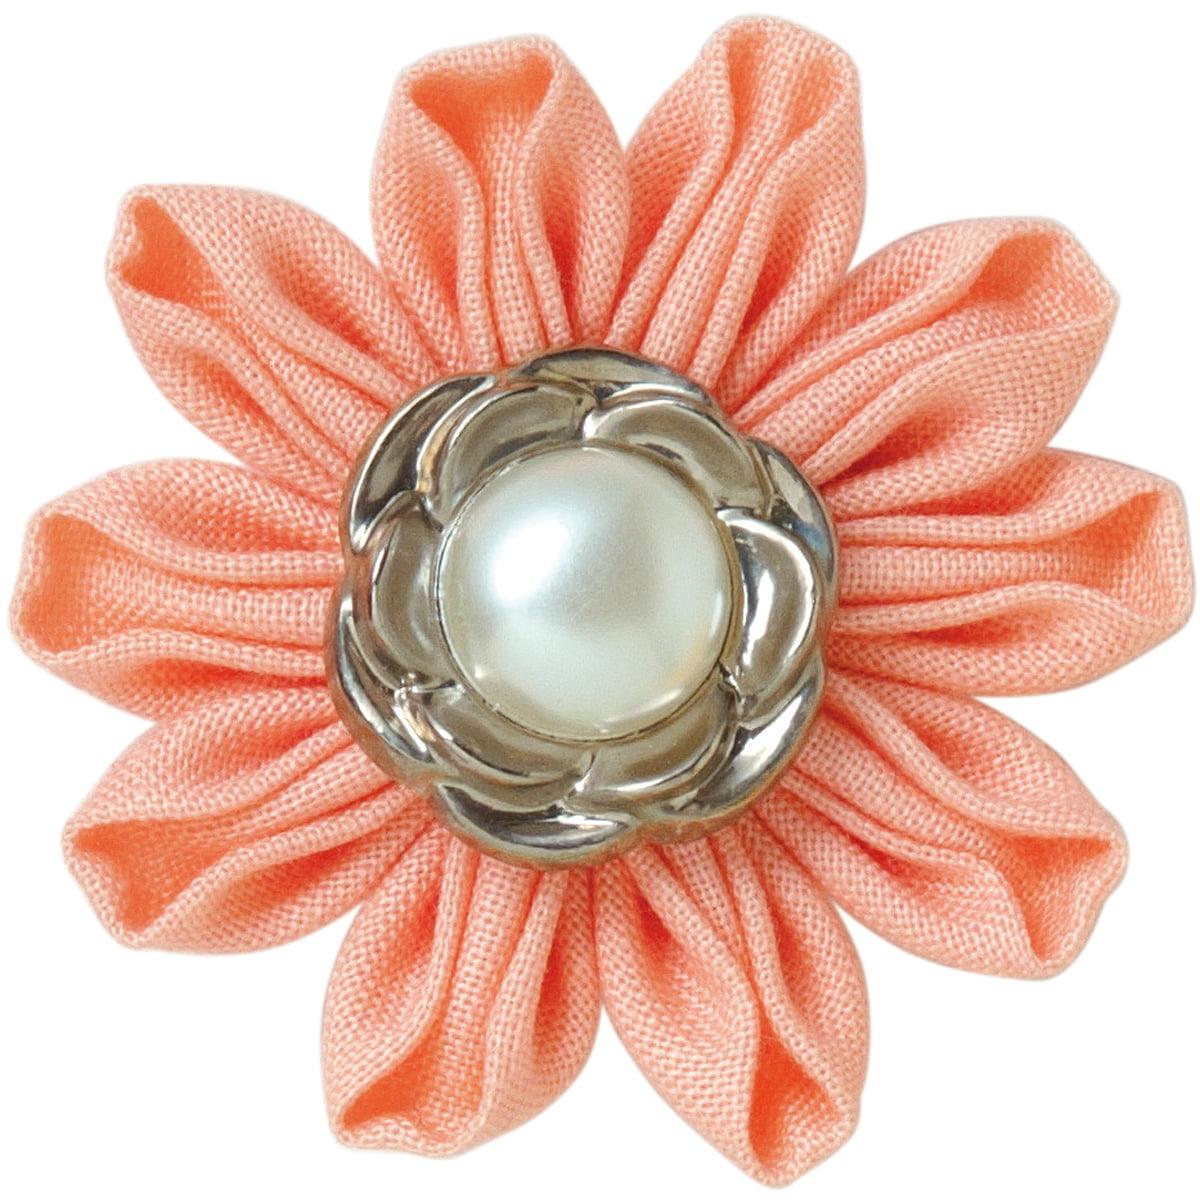 Kanzashi Flower Maker - Daisy Petal Extra Small